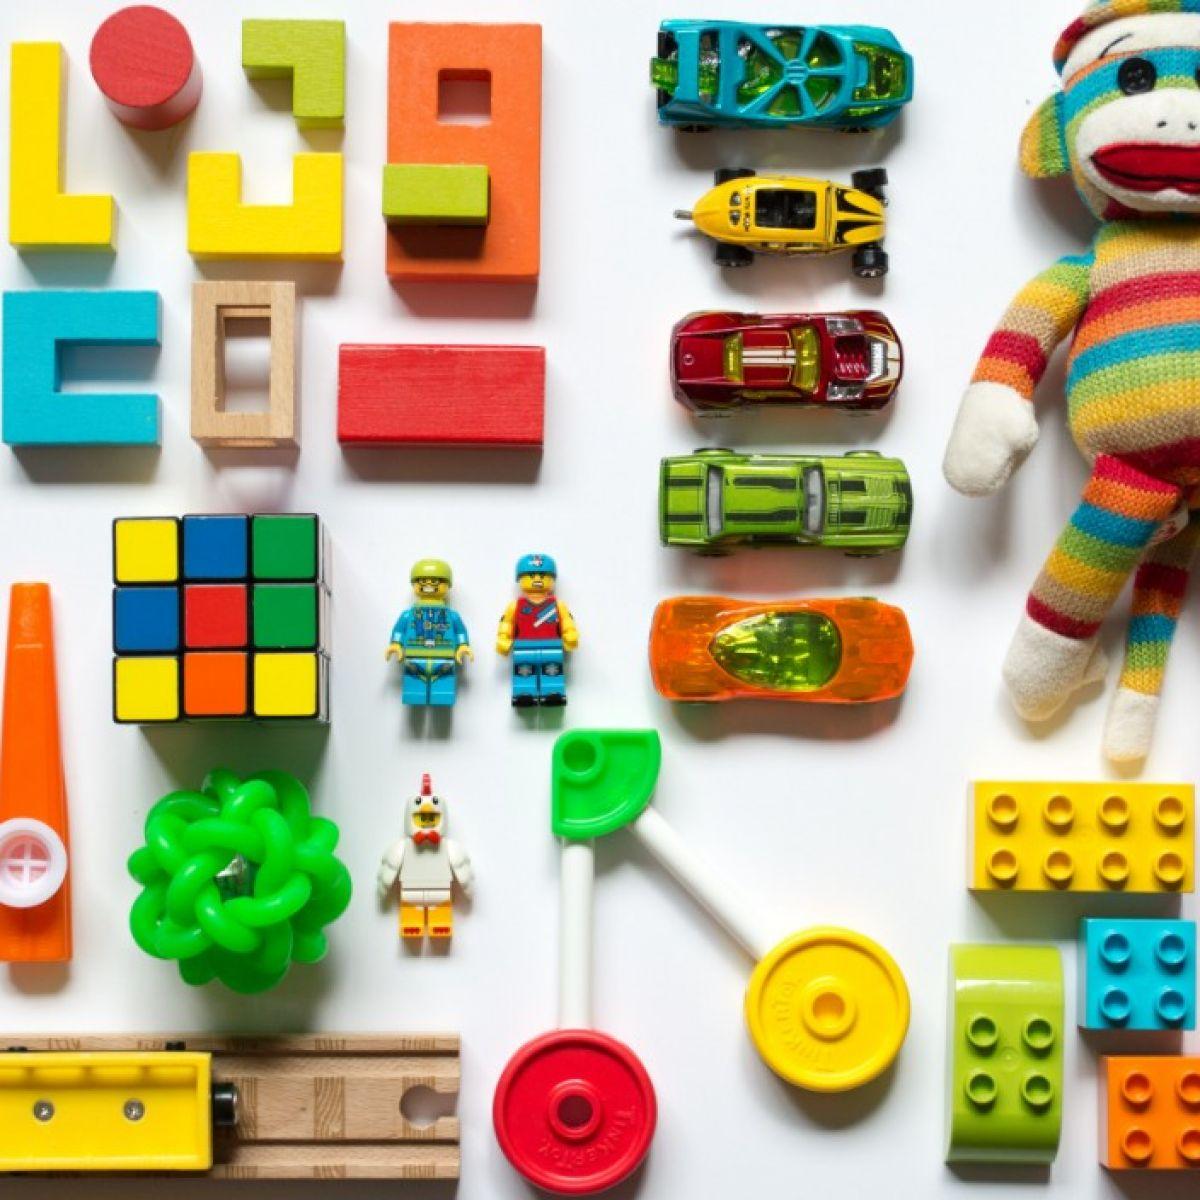 ¿Juguete-artefacto o juguete-instrumento?